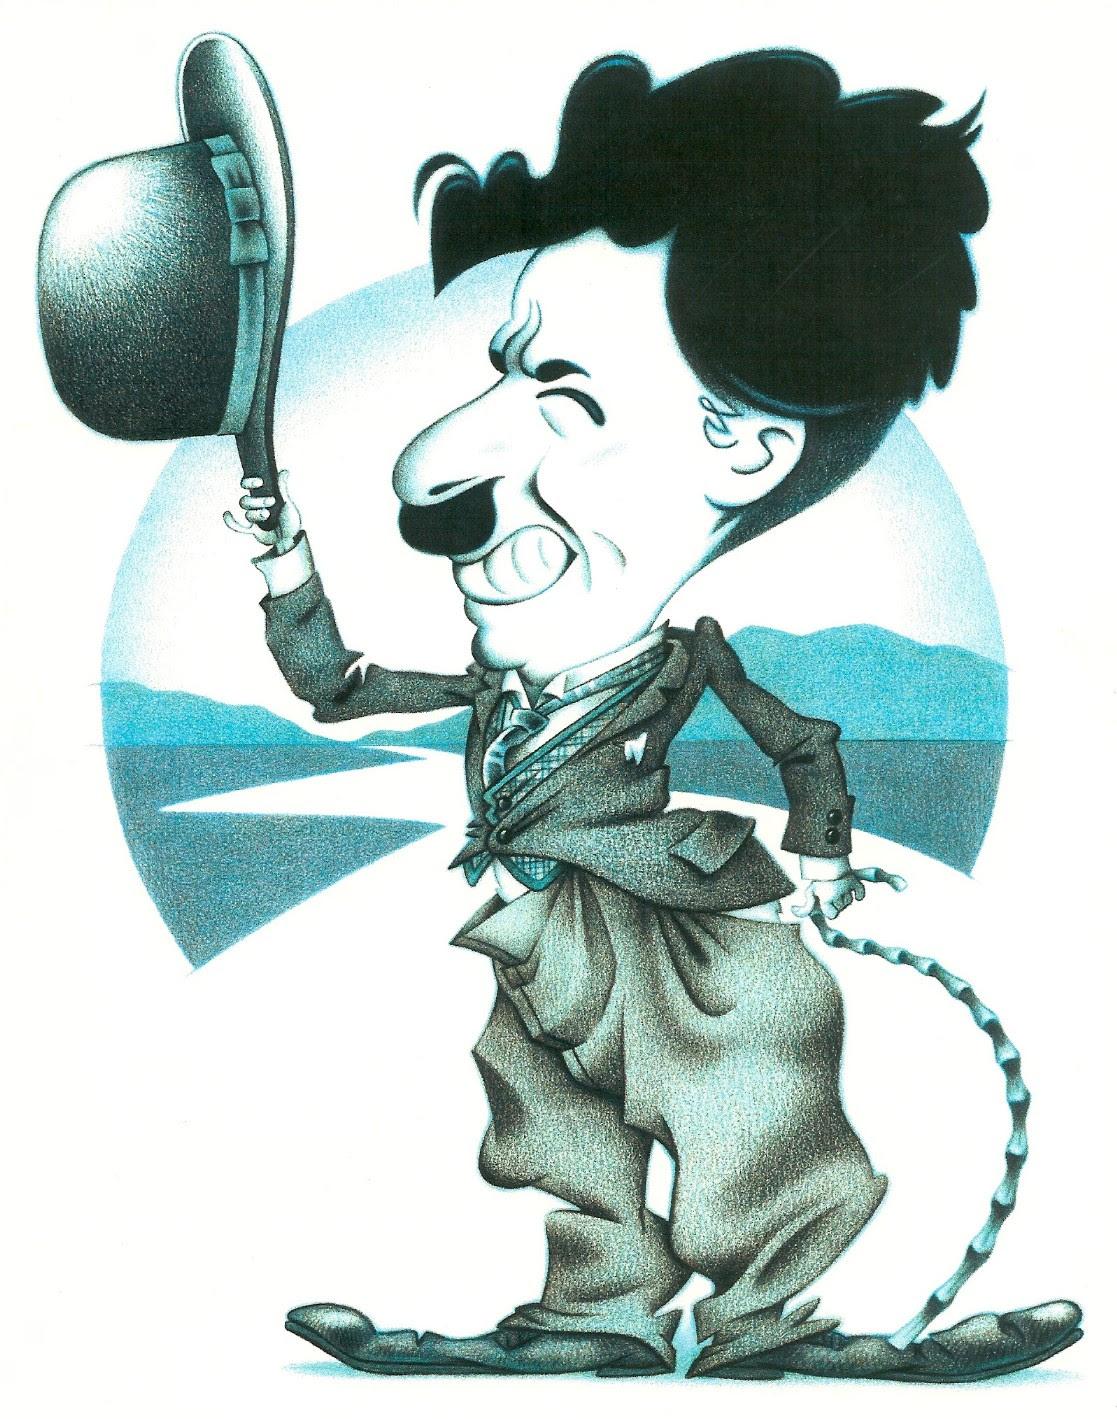 http://upload.wikimedia.org/wikipedia/commons/f/f7/Chaplin_caricature.JPG